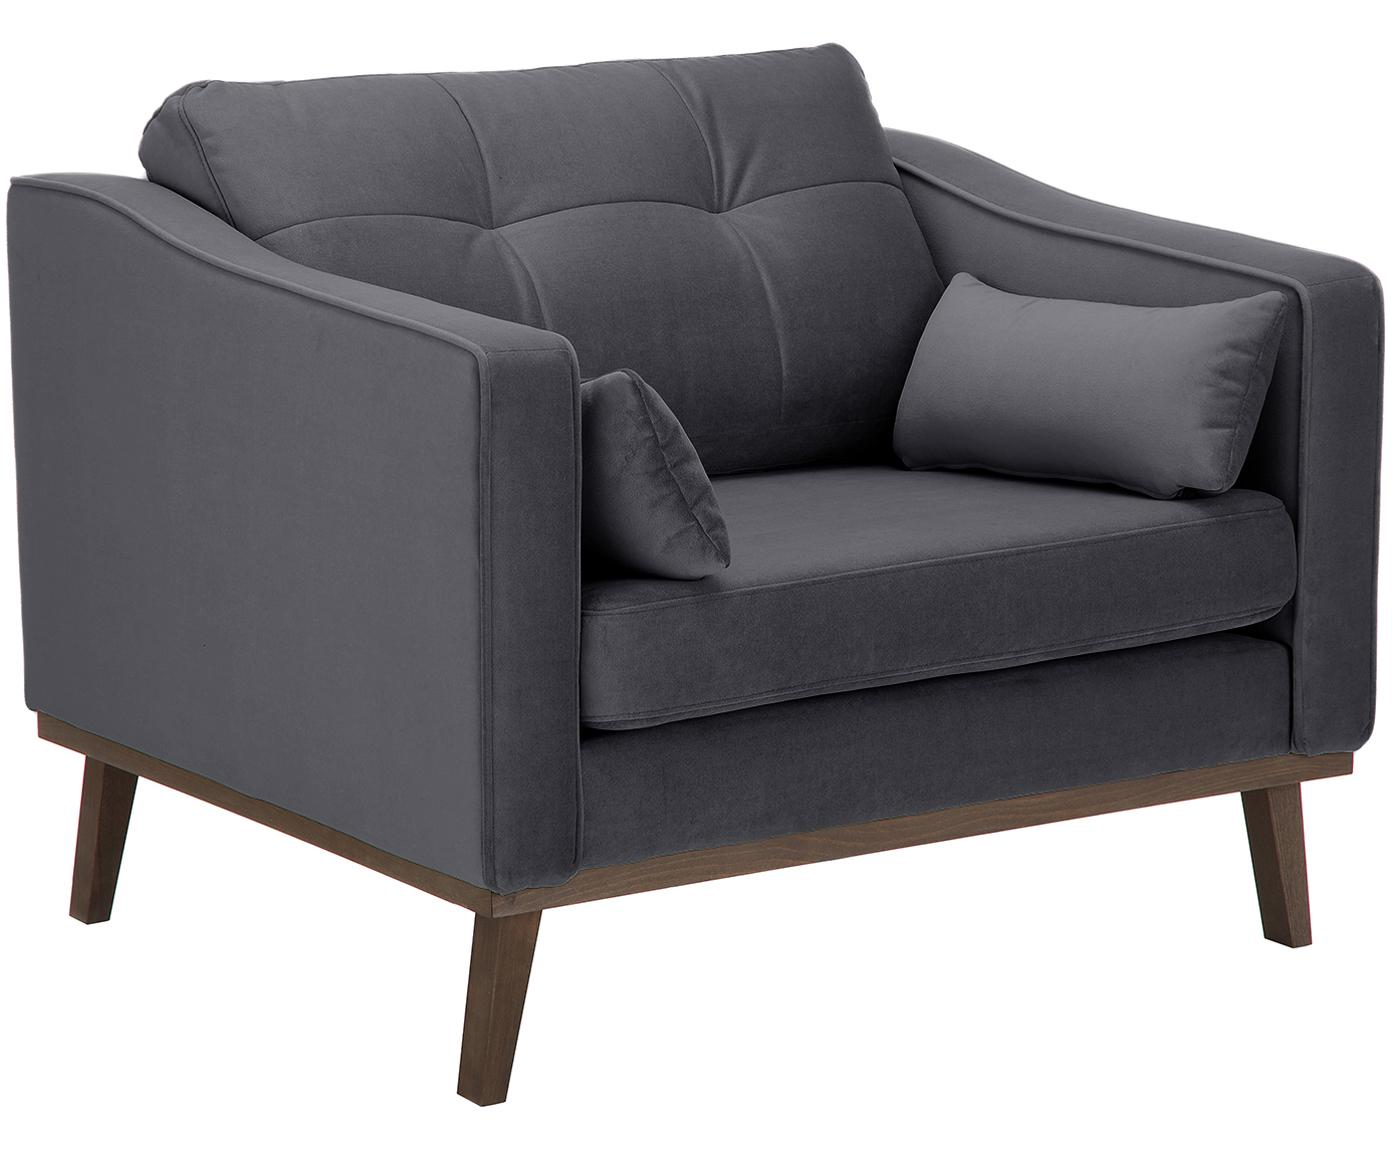 Klassischer Samt-Sessel Alva in Grau, Bezug: Samt (Hochwertiger Polyes, Gestell: Massives Kiefernholz, Samt Dunkelgrau, B 102 x T 92 cm